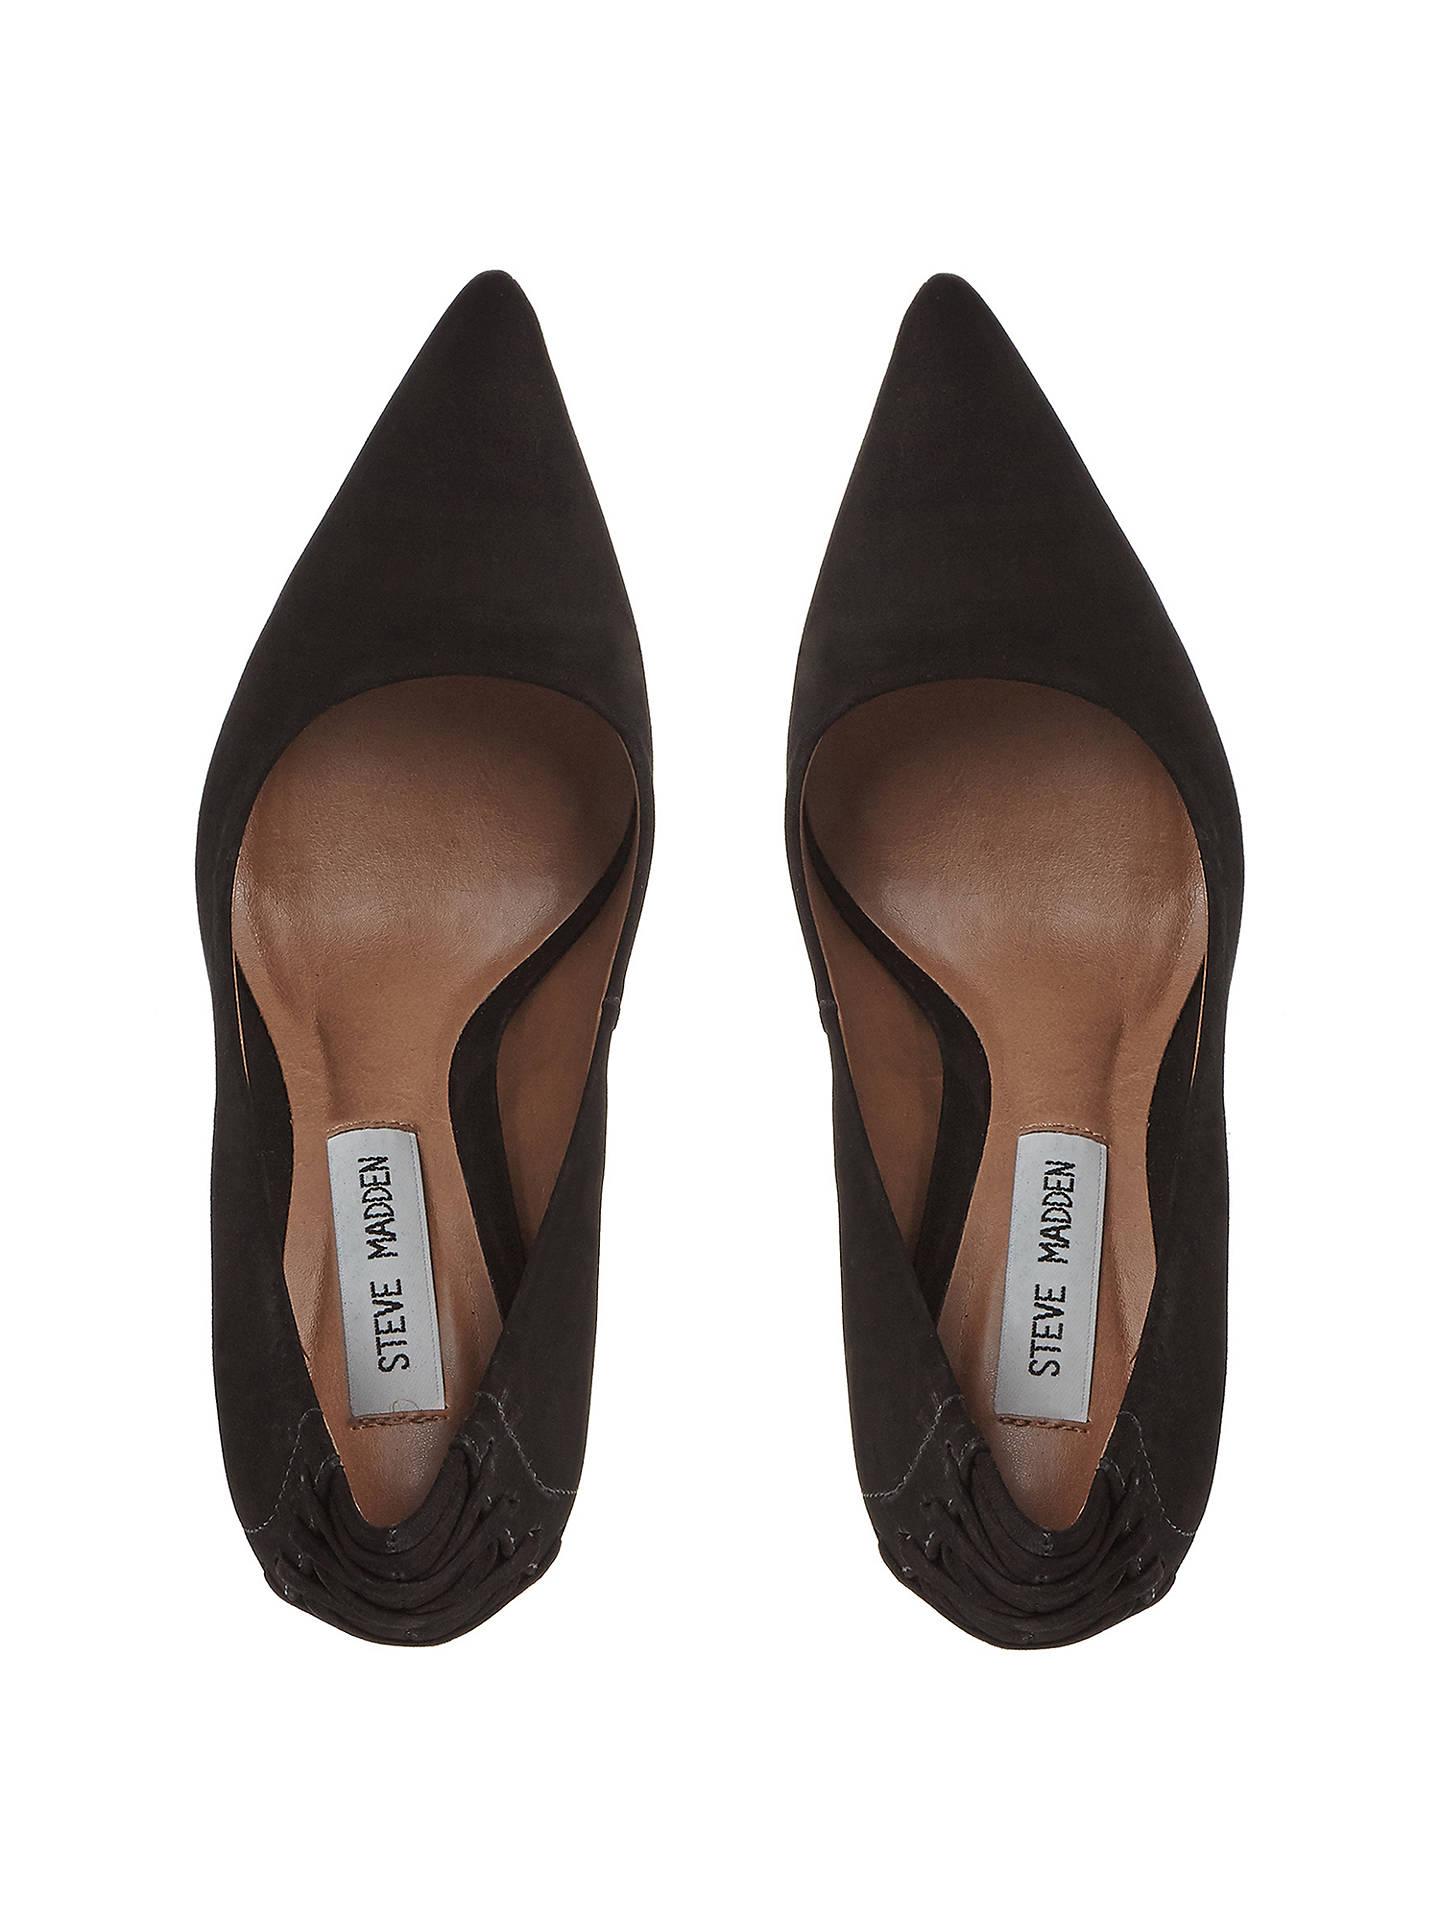 459d6f8b8ba Steve Madden Paiton Lace Detail Stiletto Heel Court Shoes at John ...